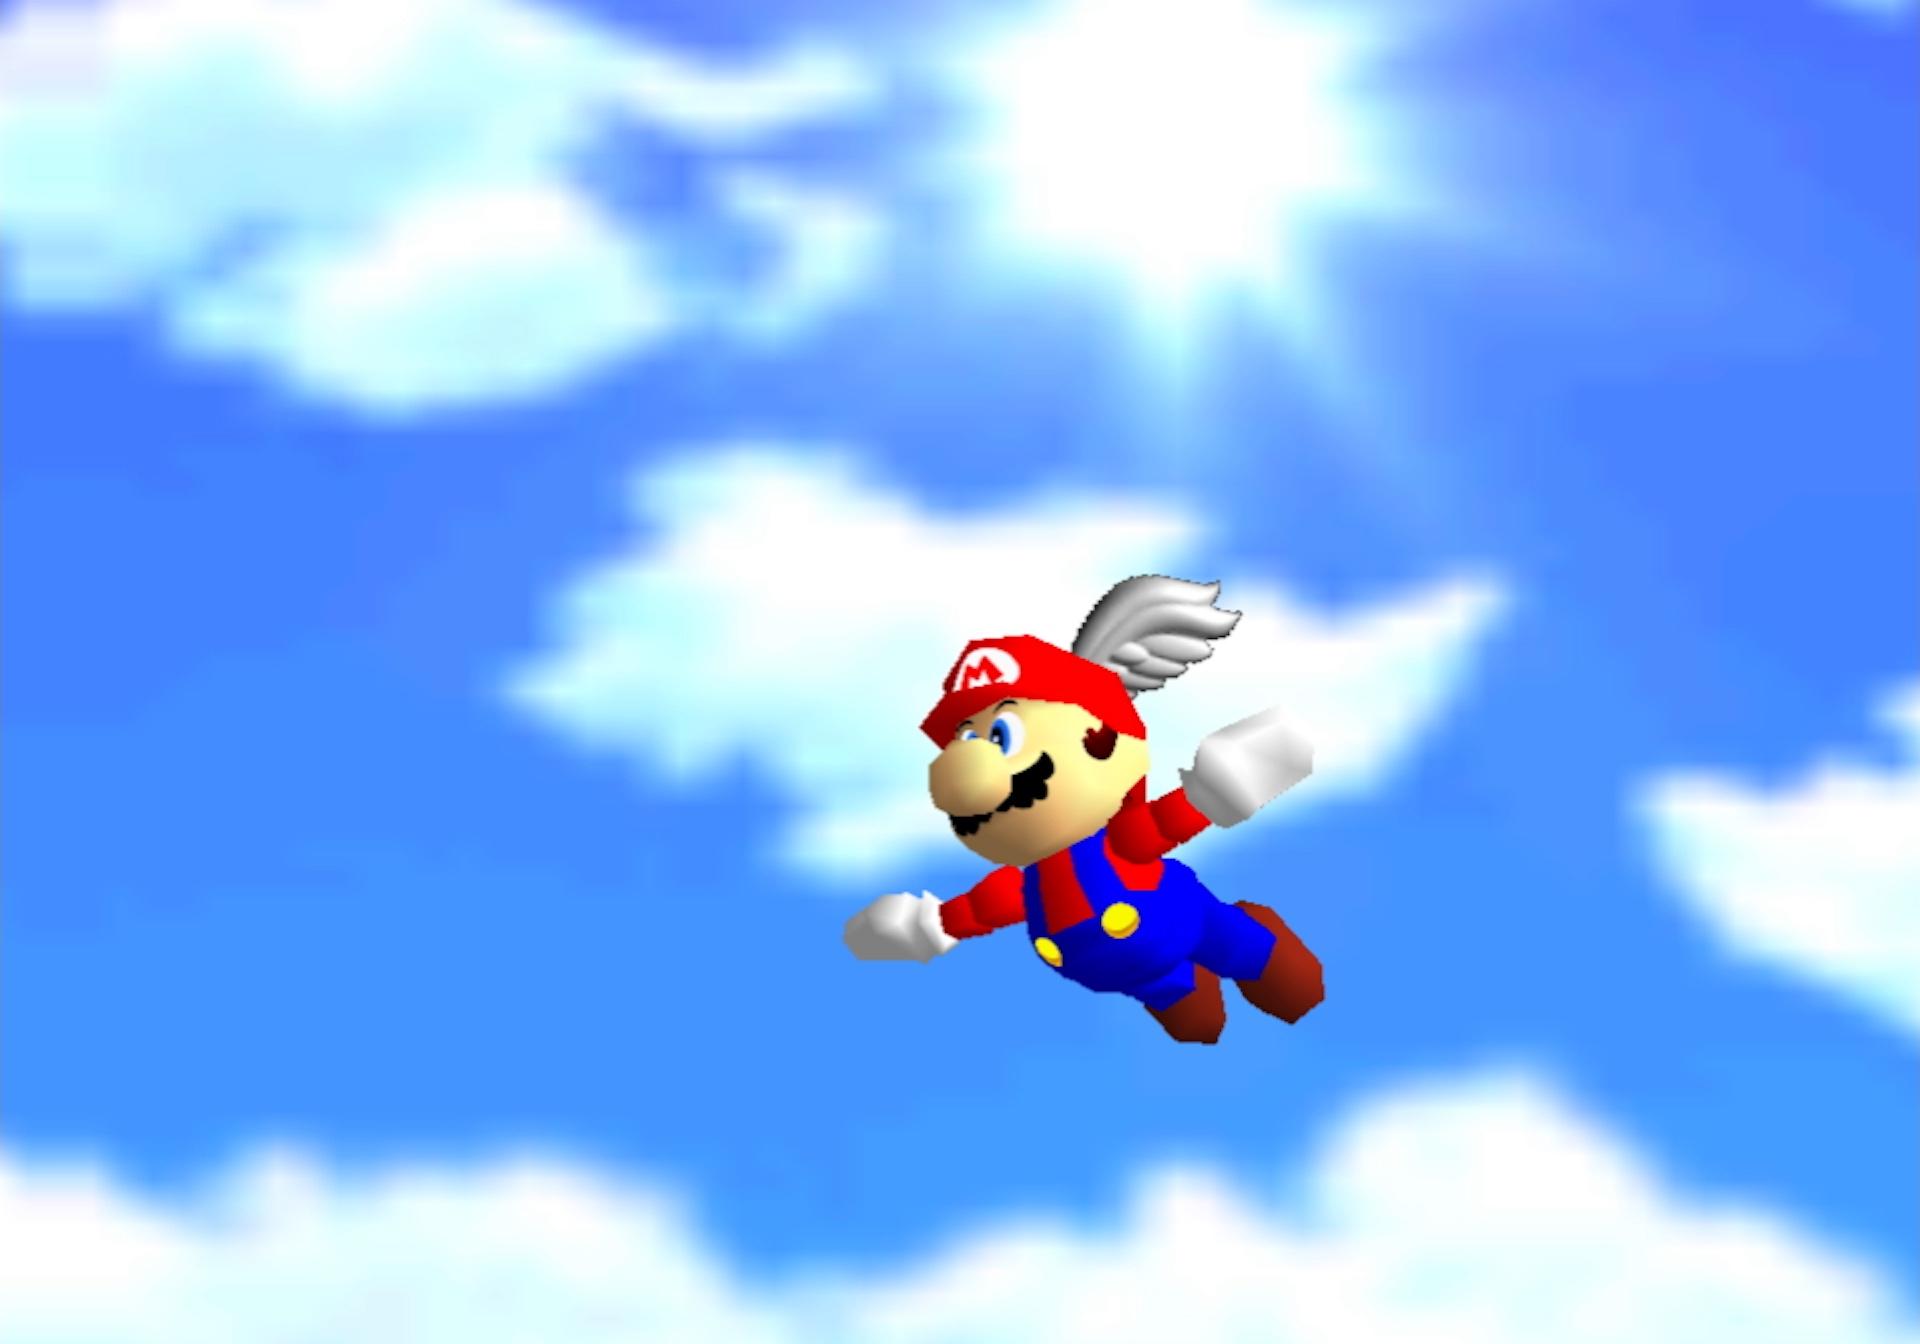 Mario flies against a cloudy blue sky in a screenshot from Super Mario 64